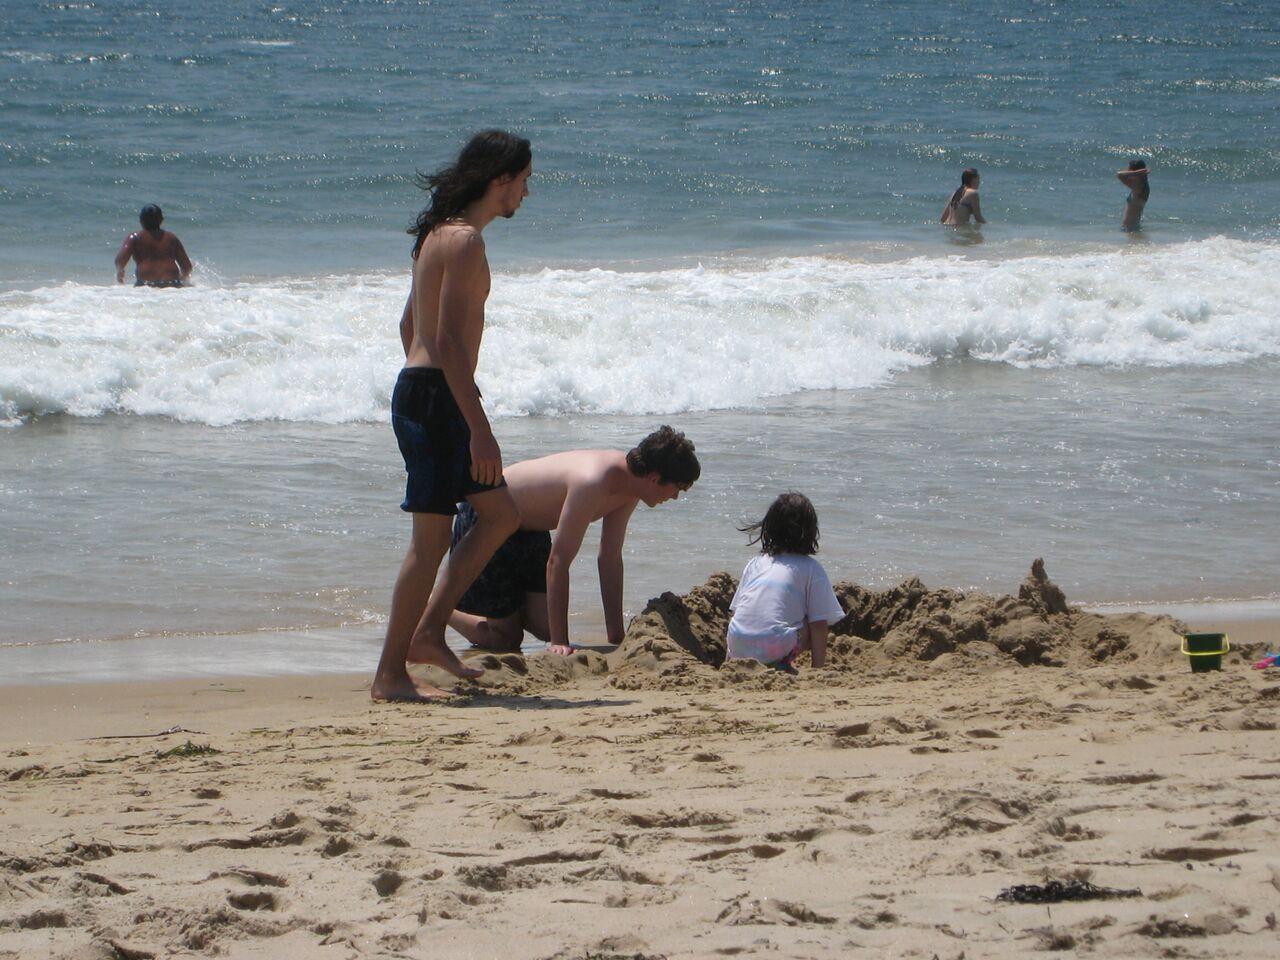 The Simpson children enjoy the sandy beach